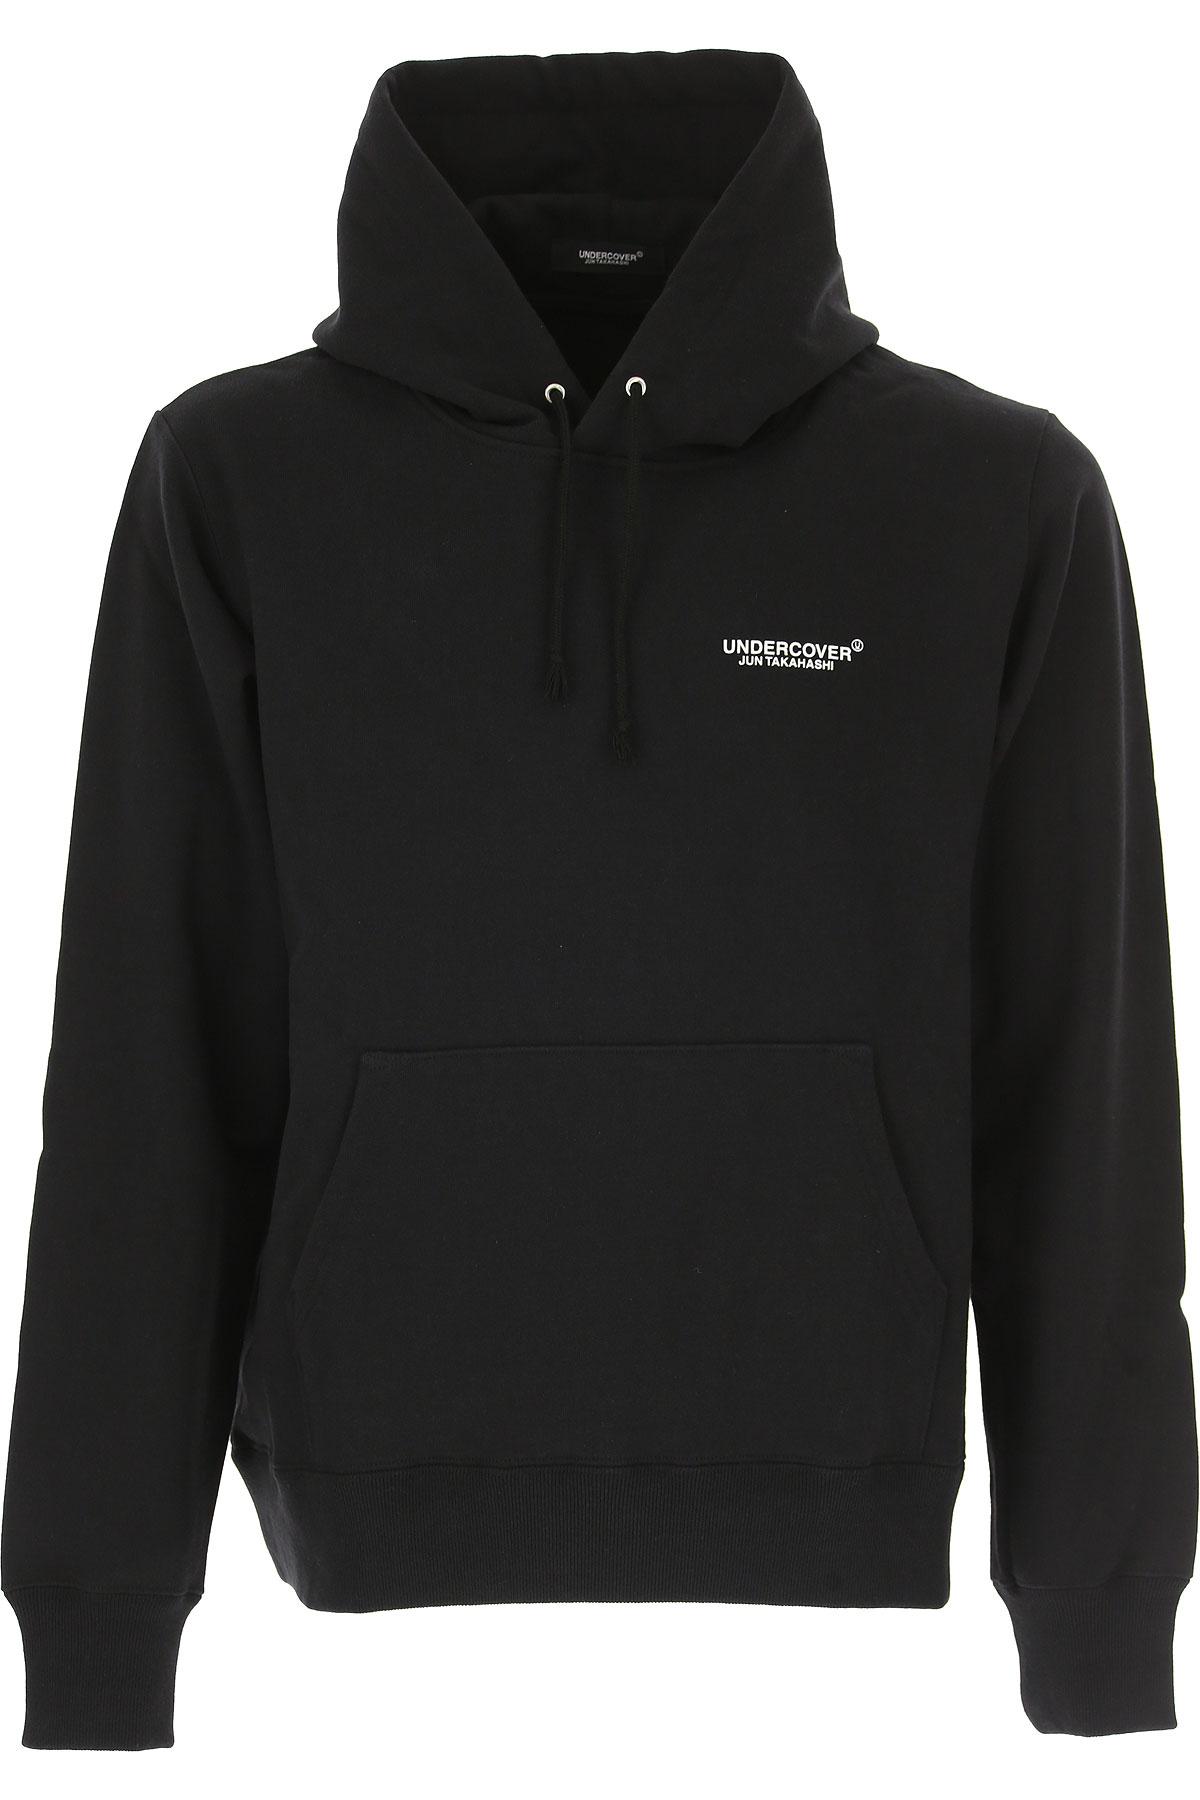 Image of Undercover Sweater for Men Jumper, Black, Cotton, 2017, L M XL